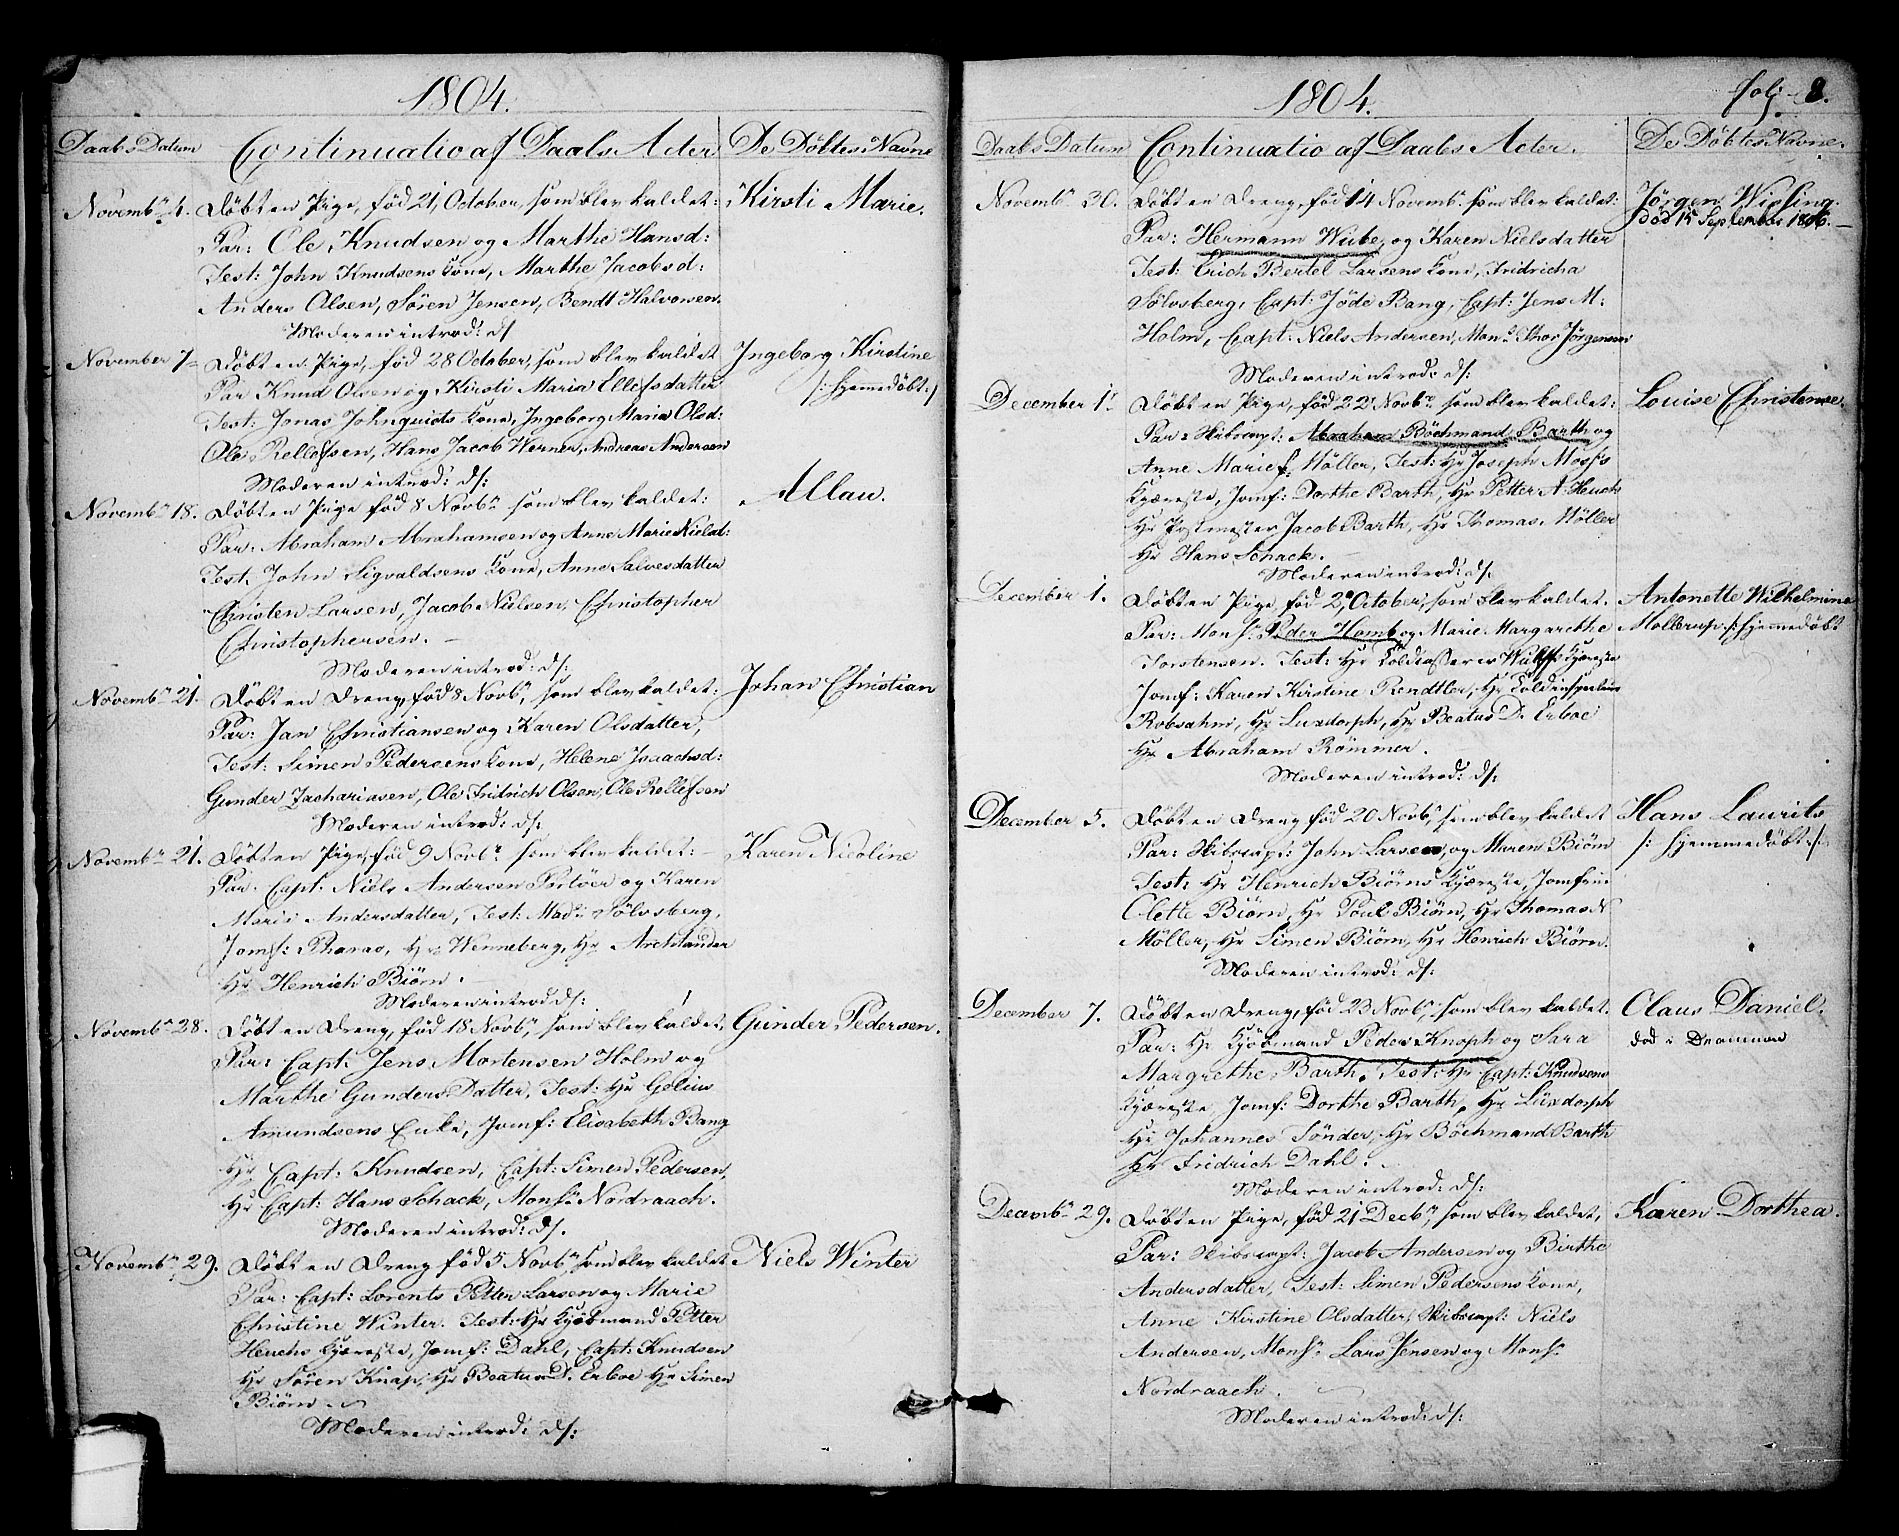 SAKO, Kragerø kirkebøker, F/Fa/L0003: Ministerialbok nr. 3, 1802-1813, s. 8